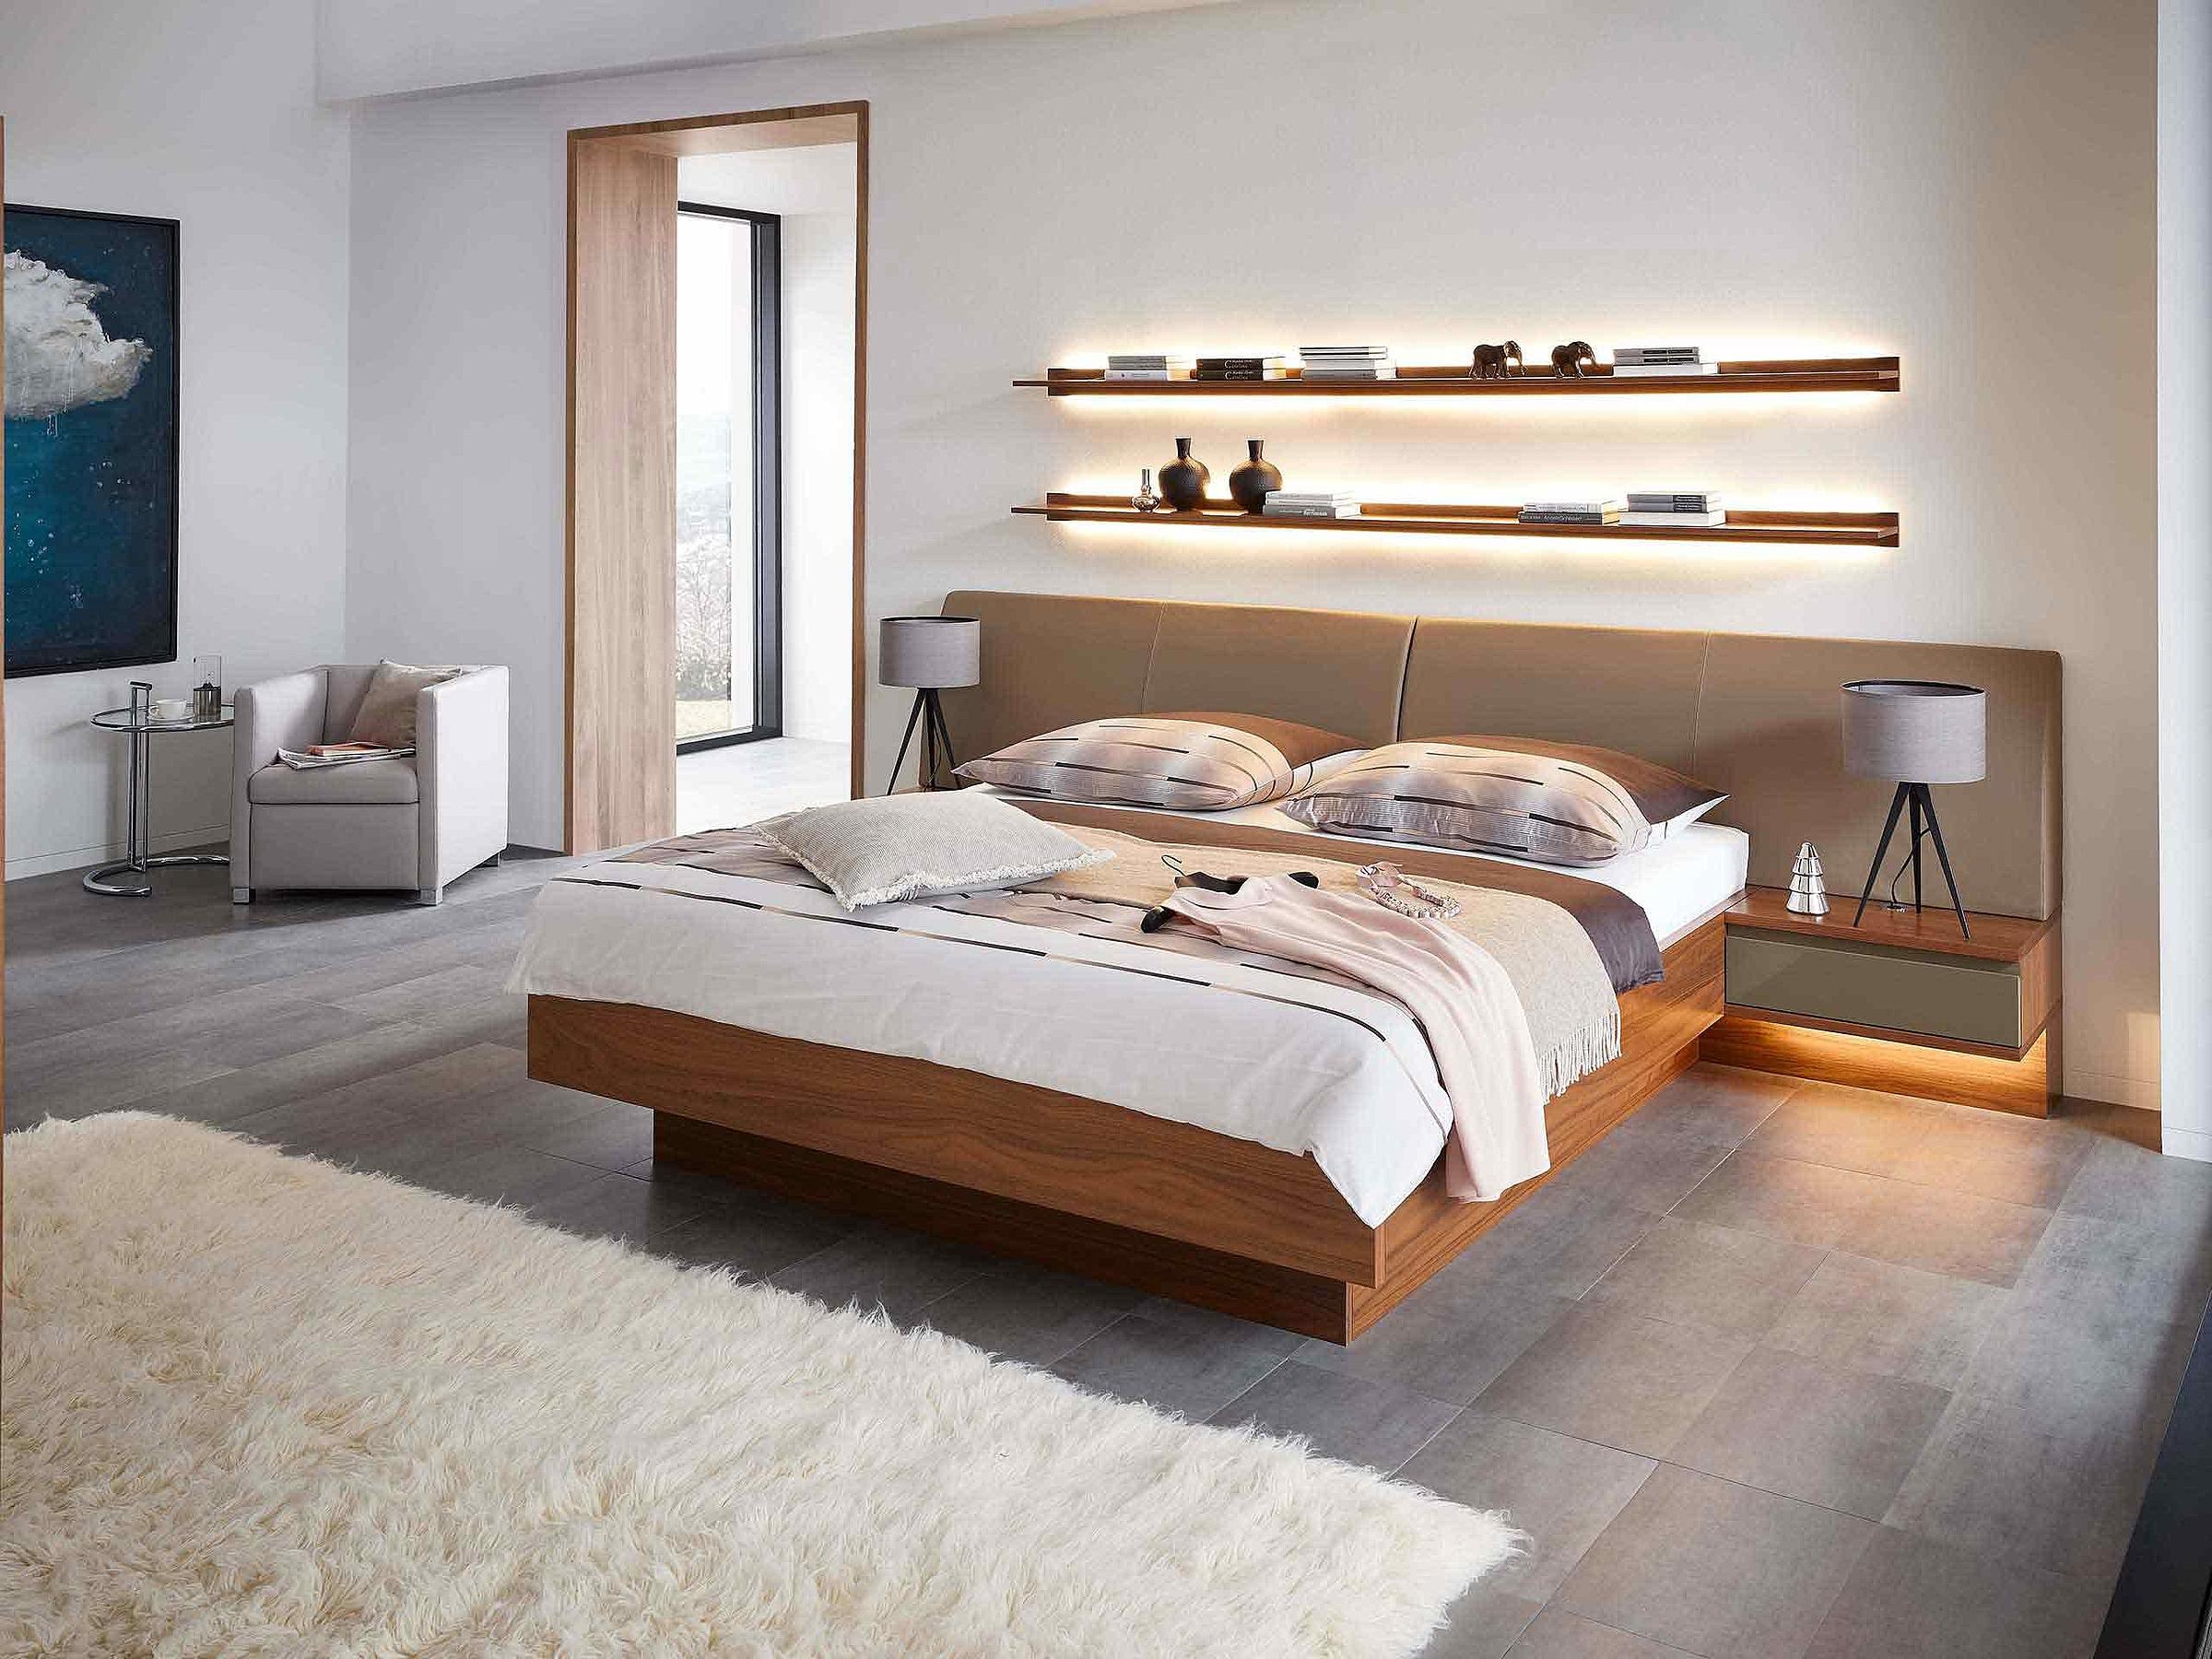 Bett Schlafzimmer Enjoy Holz Nussbaum nova